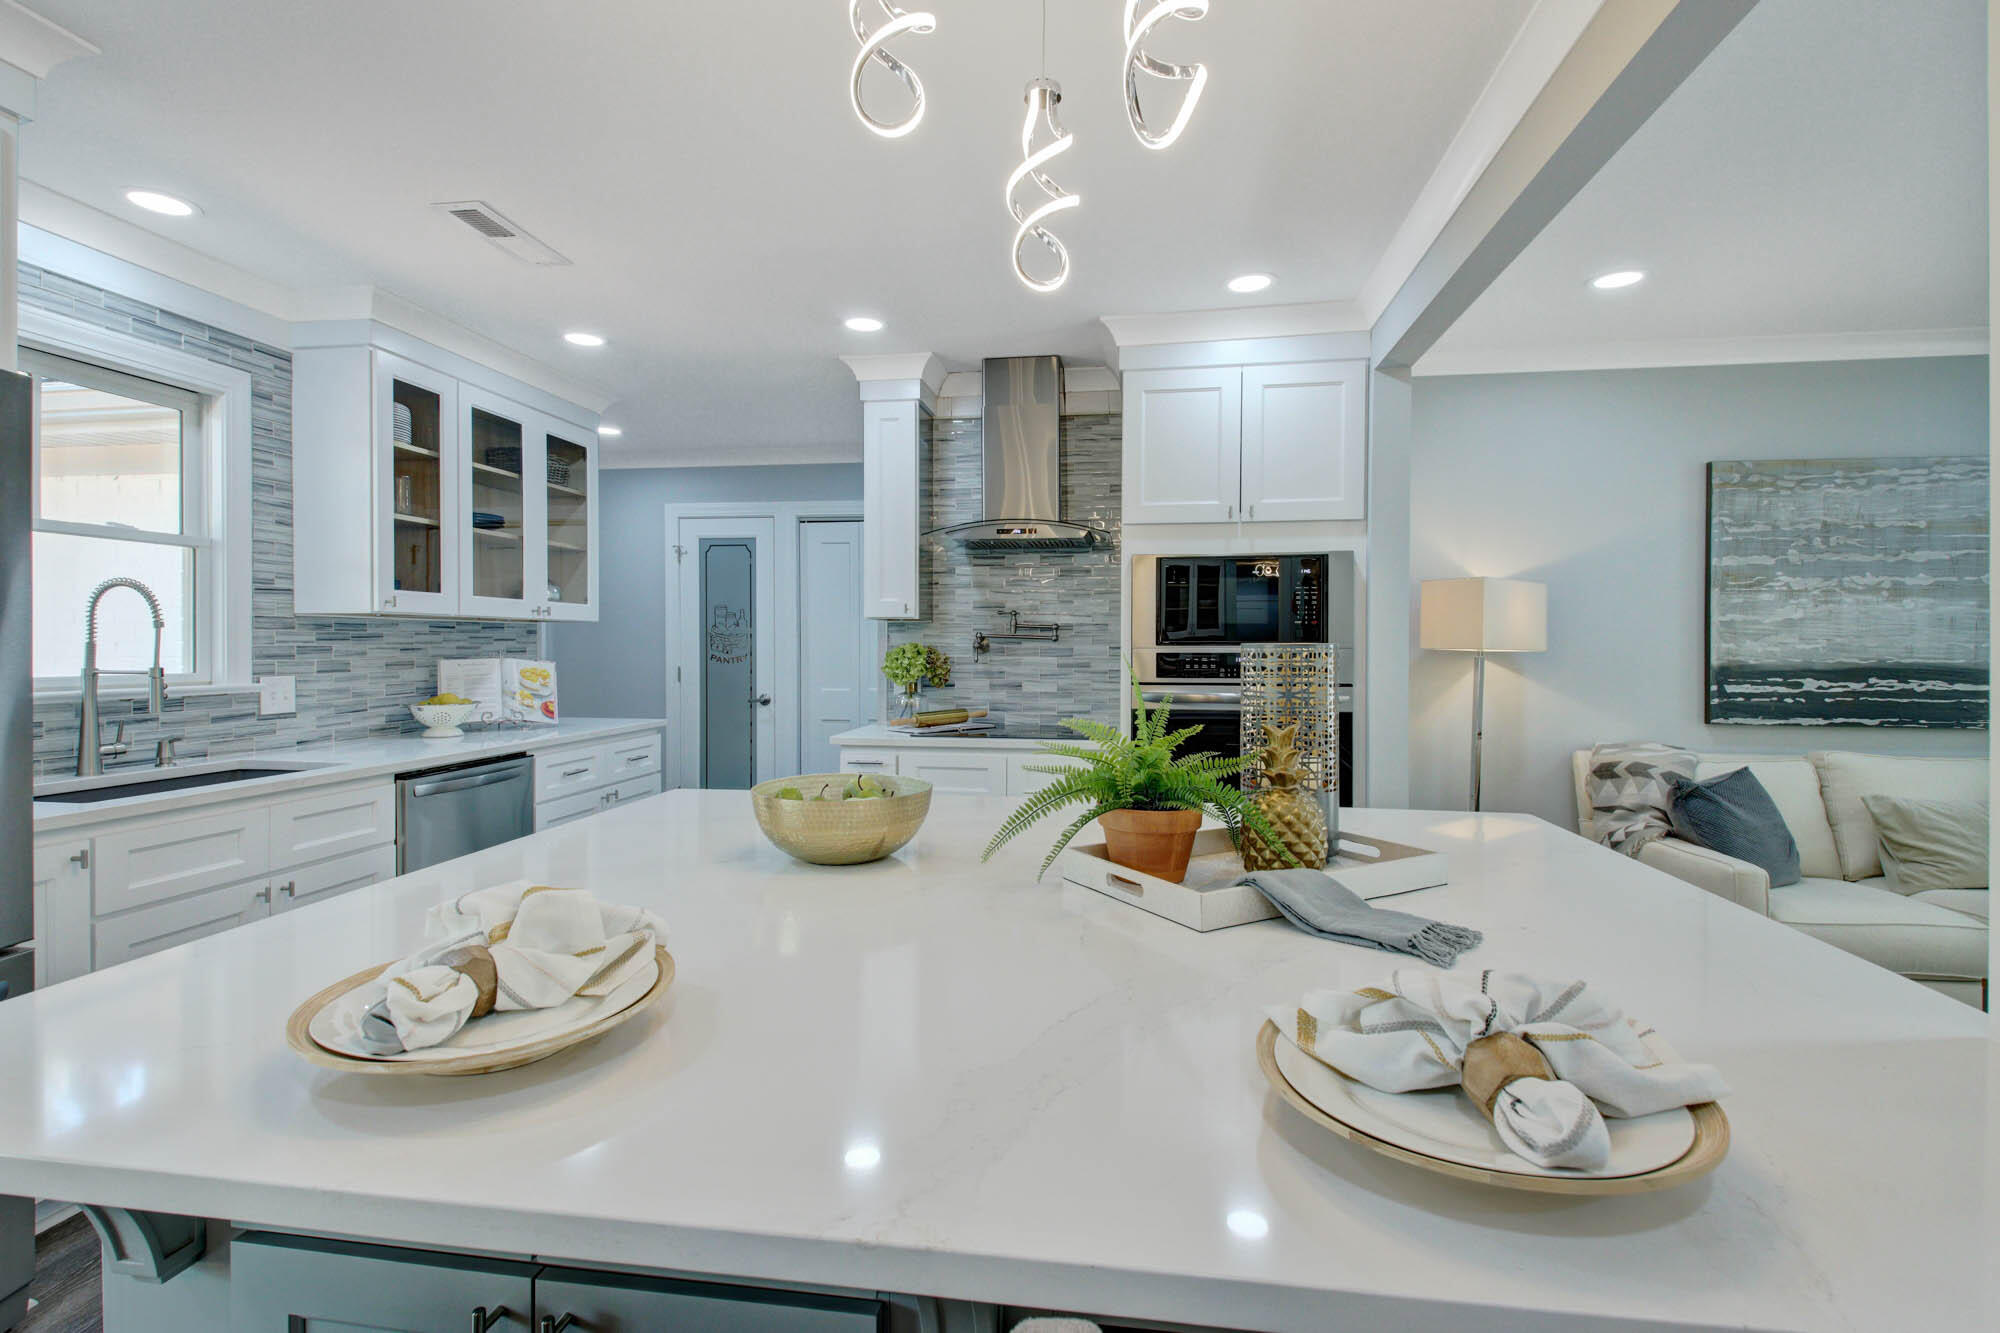 Scanlonville Homes For Sale - 344 4th, Mount Pleasant, SC - 7